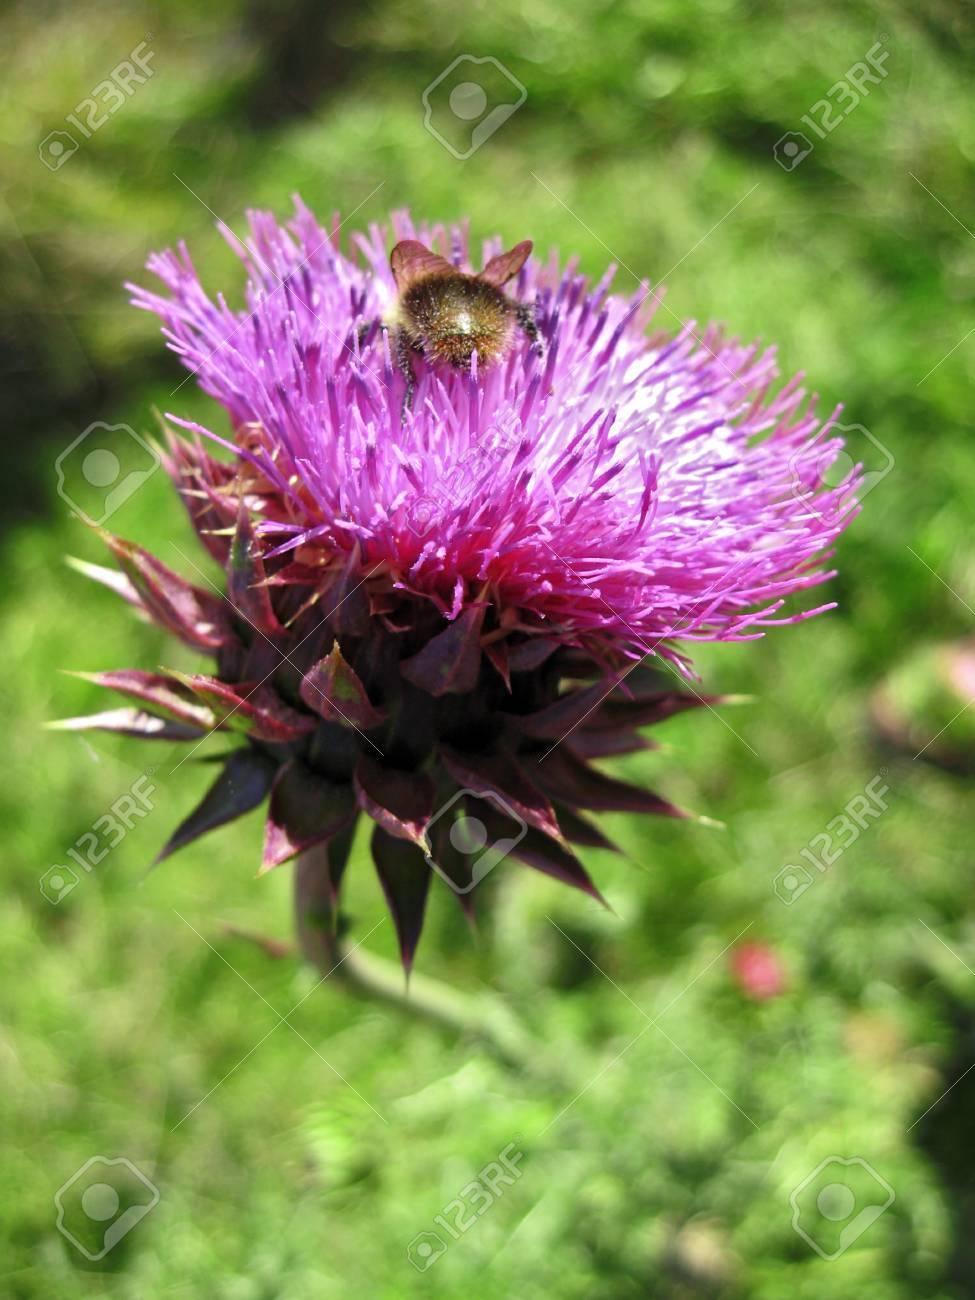 Bee landing on the thistle Stock Photo - 15846325